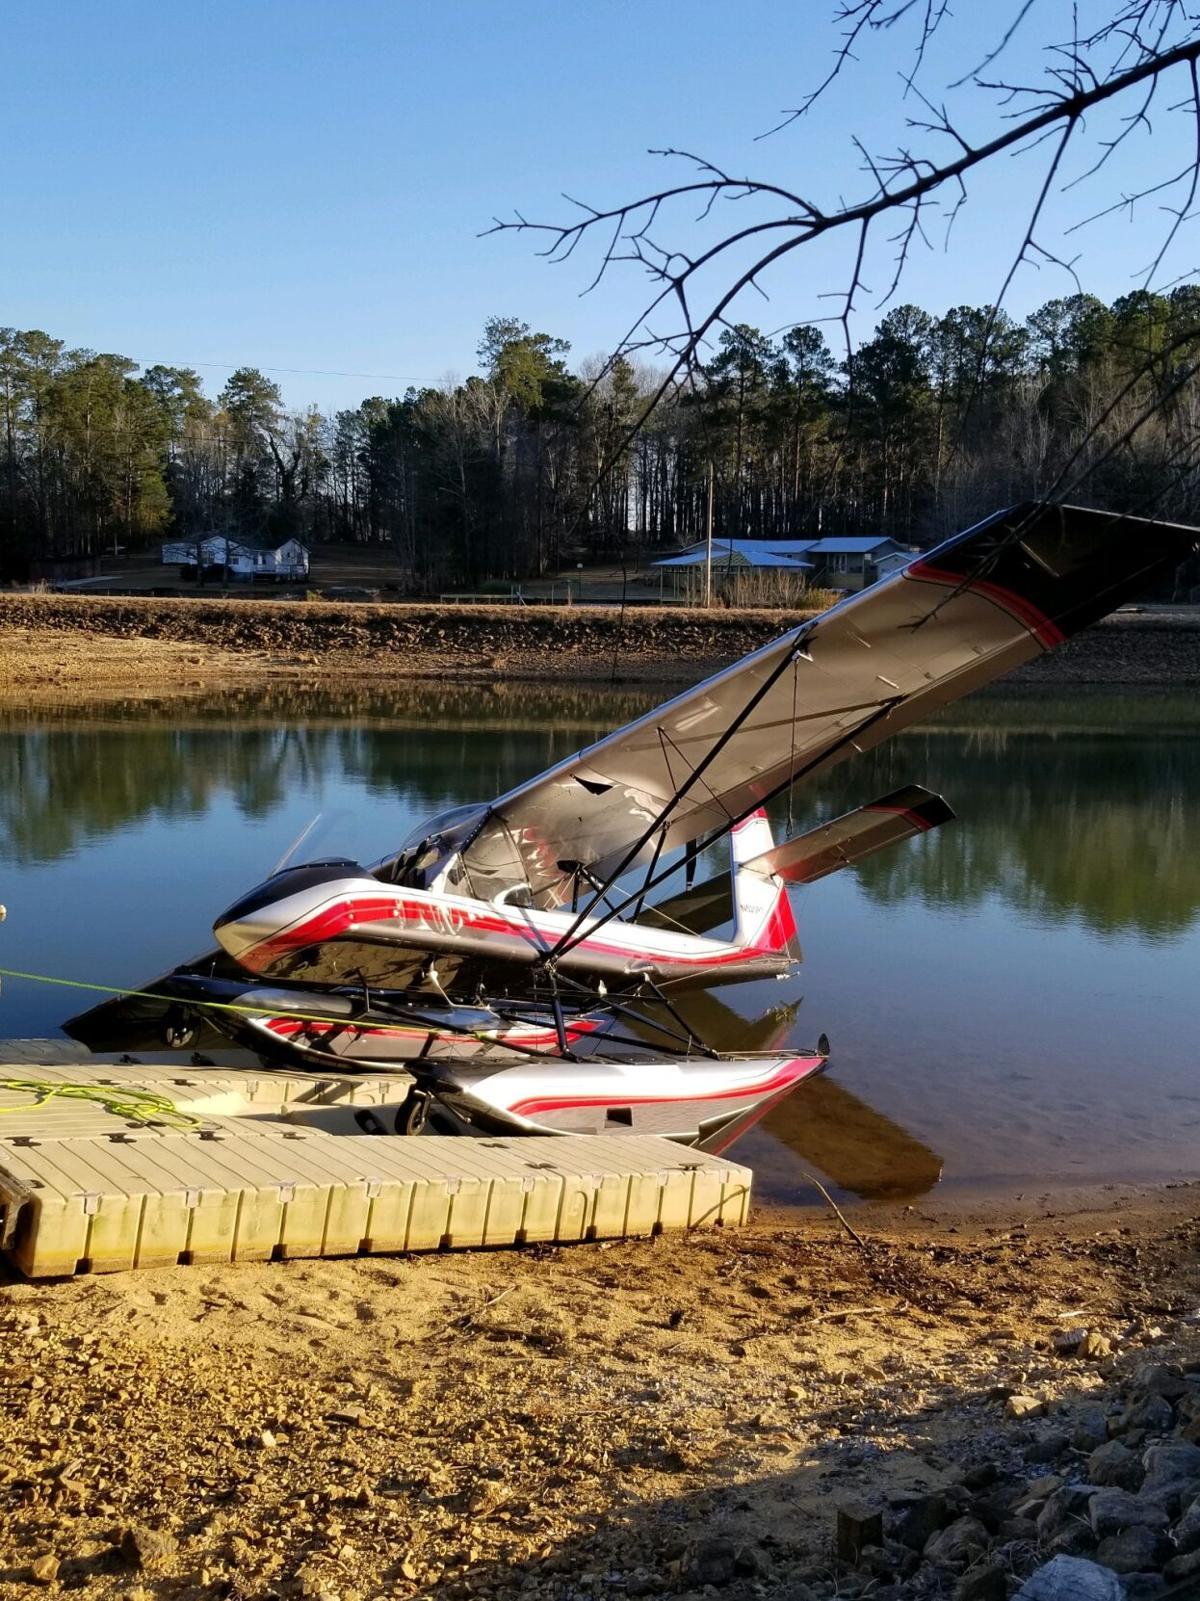 Coosa County Plane Crash